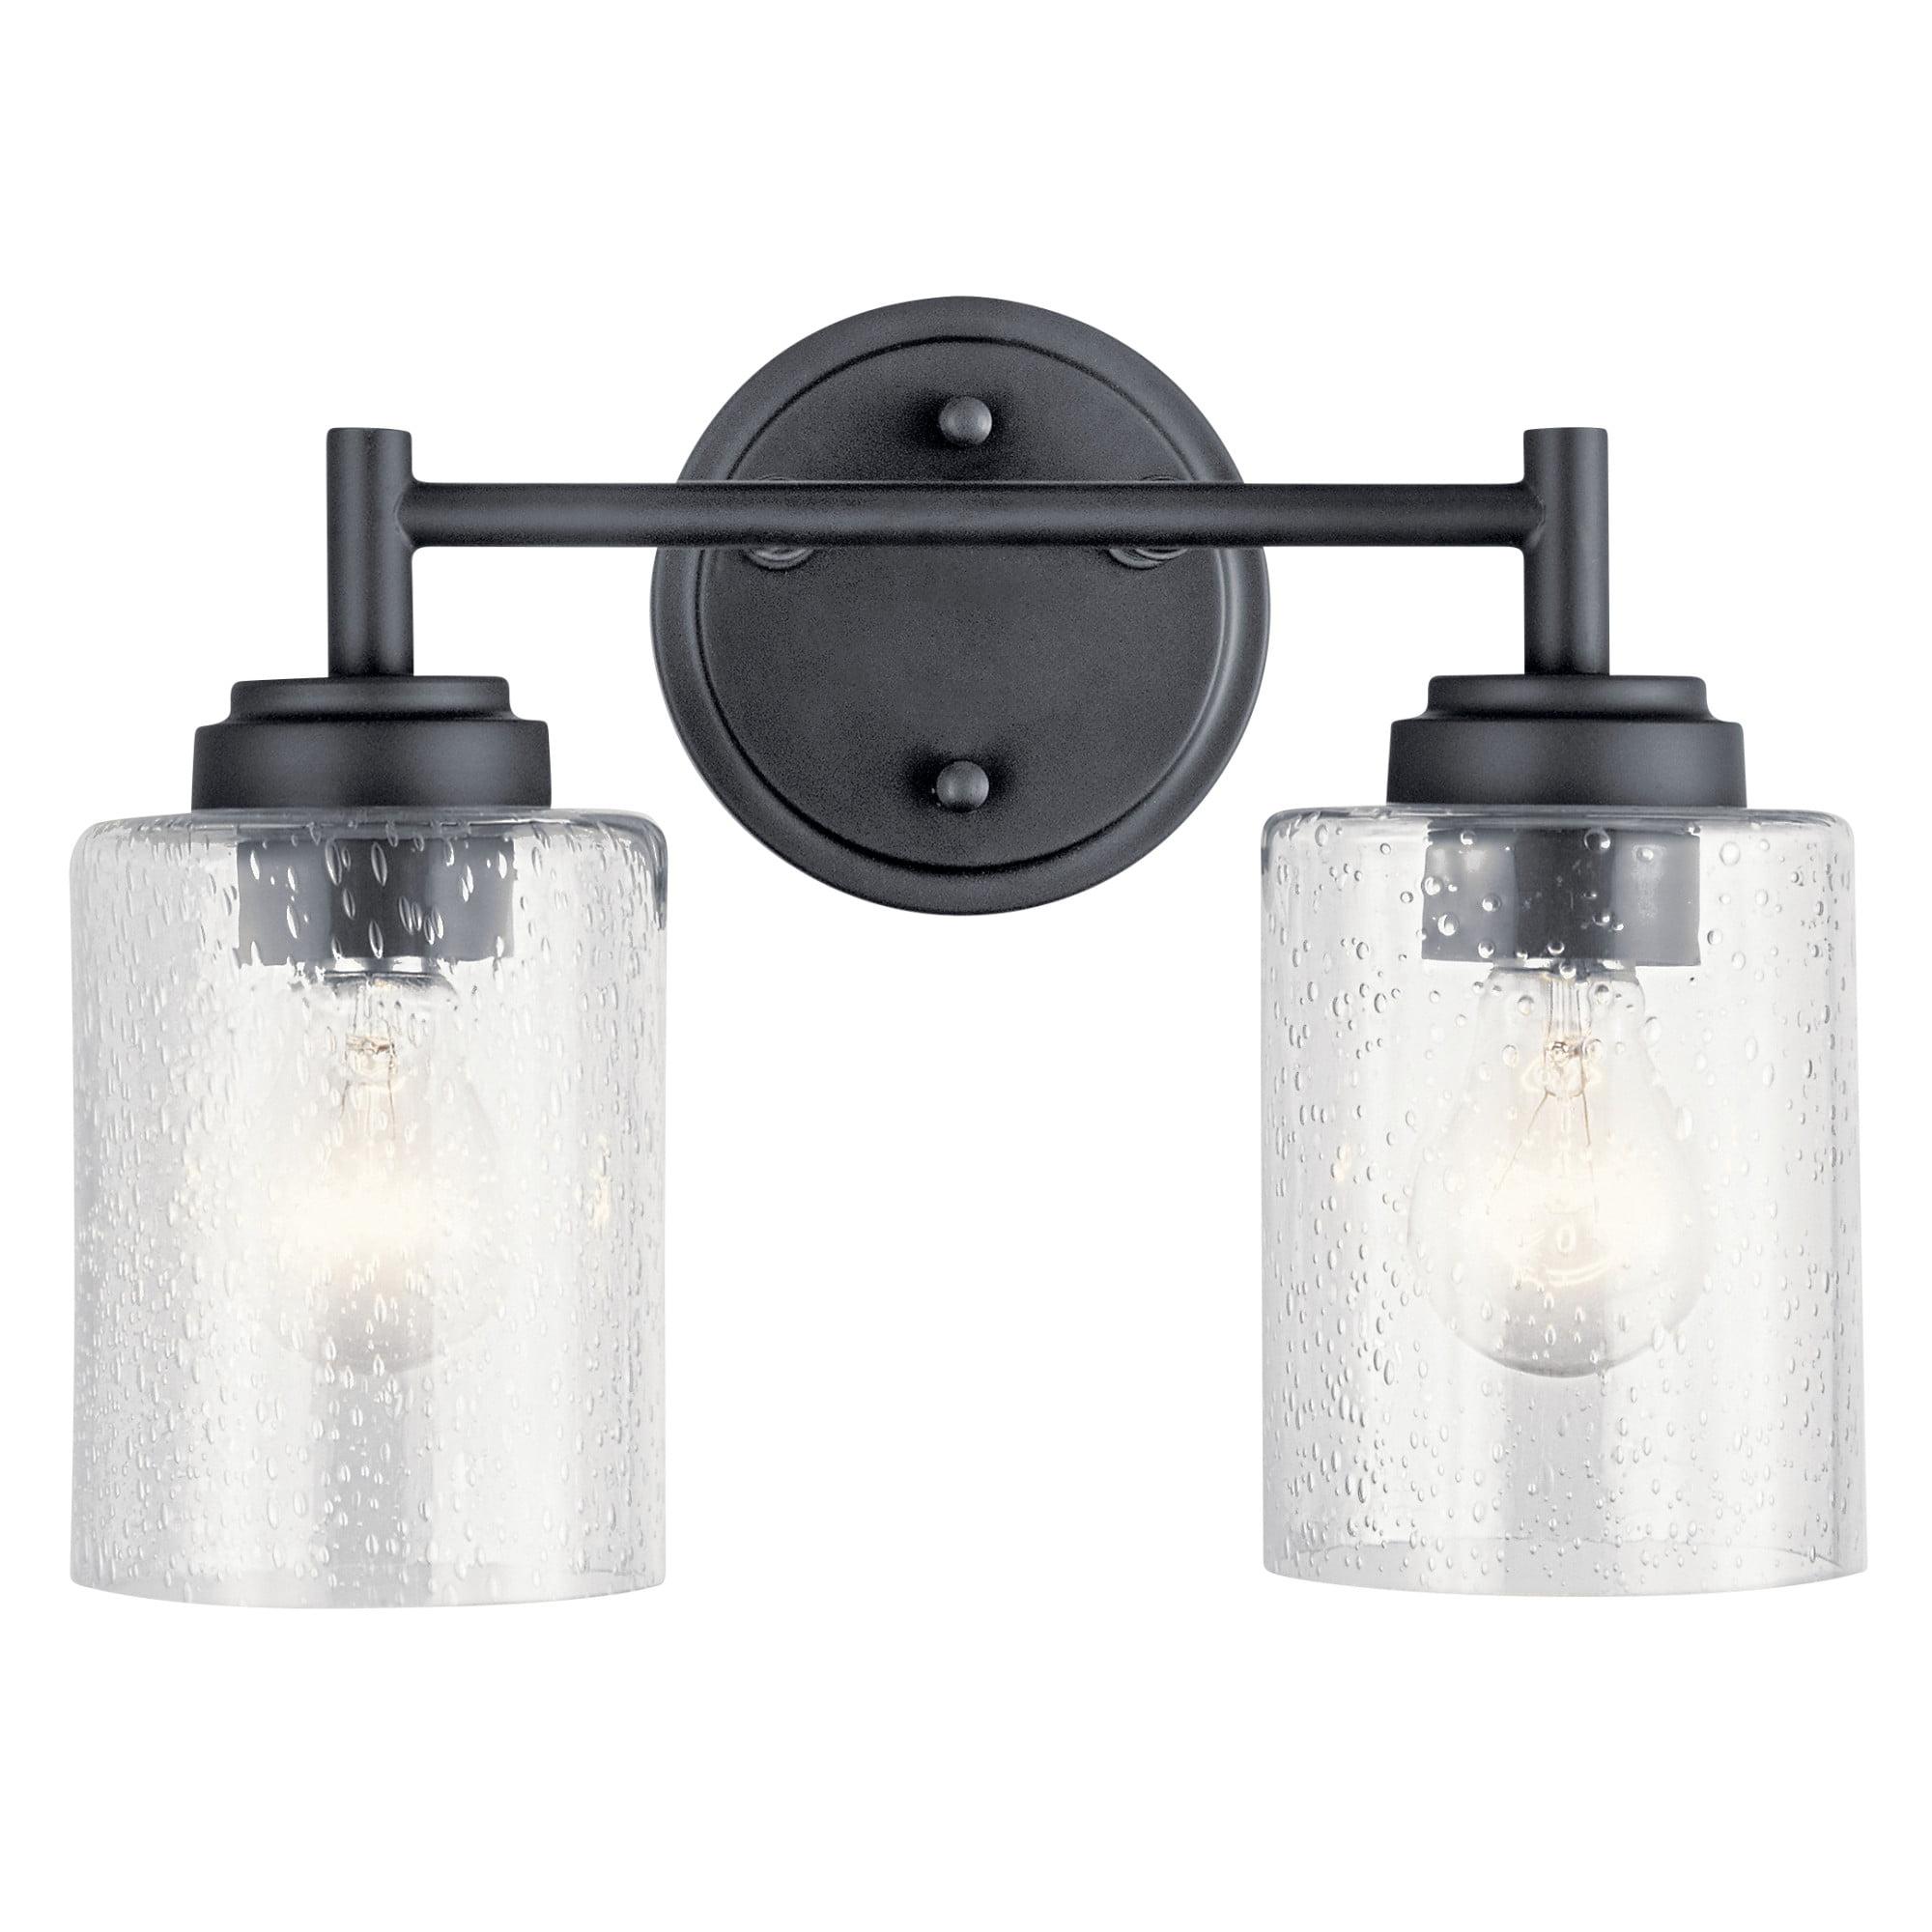 Kichler 45885 Winslow 2 Light 13 Wide Bathroom Vanity Light Walmart Com Walmart Com